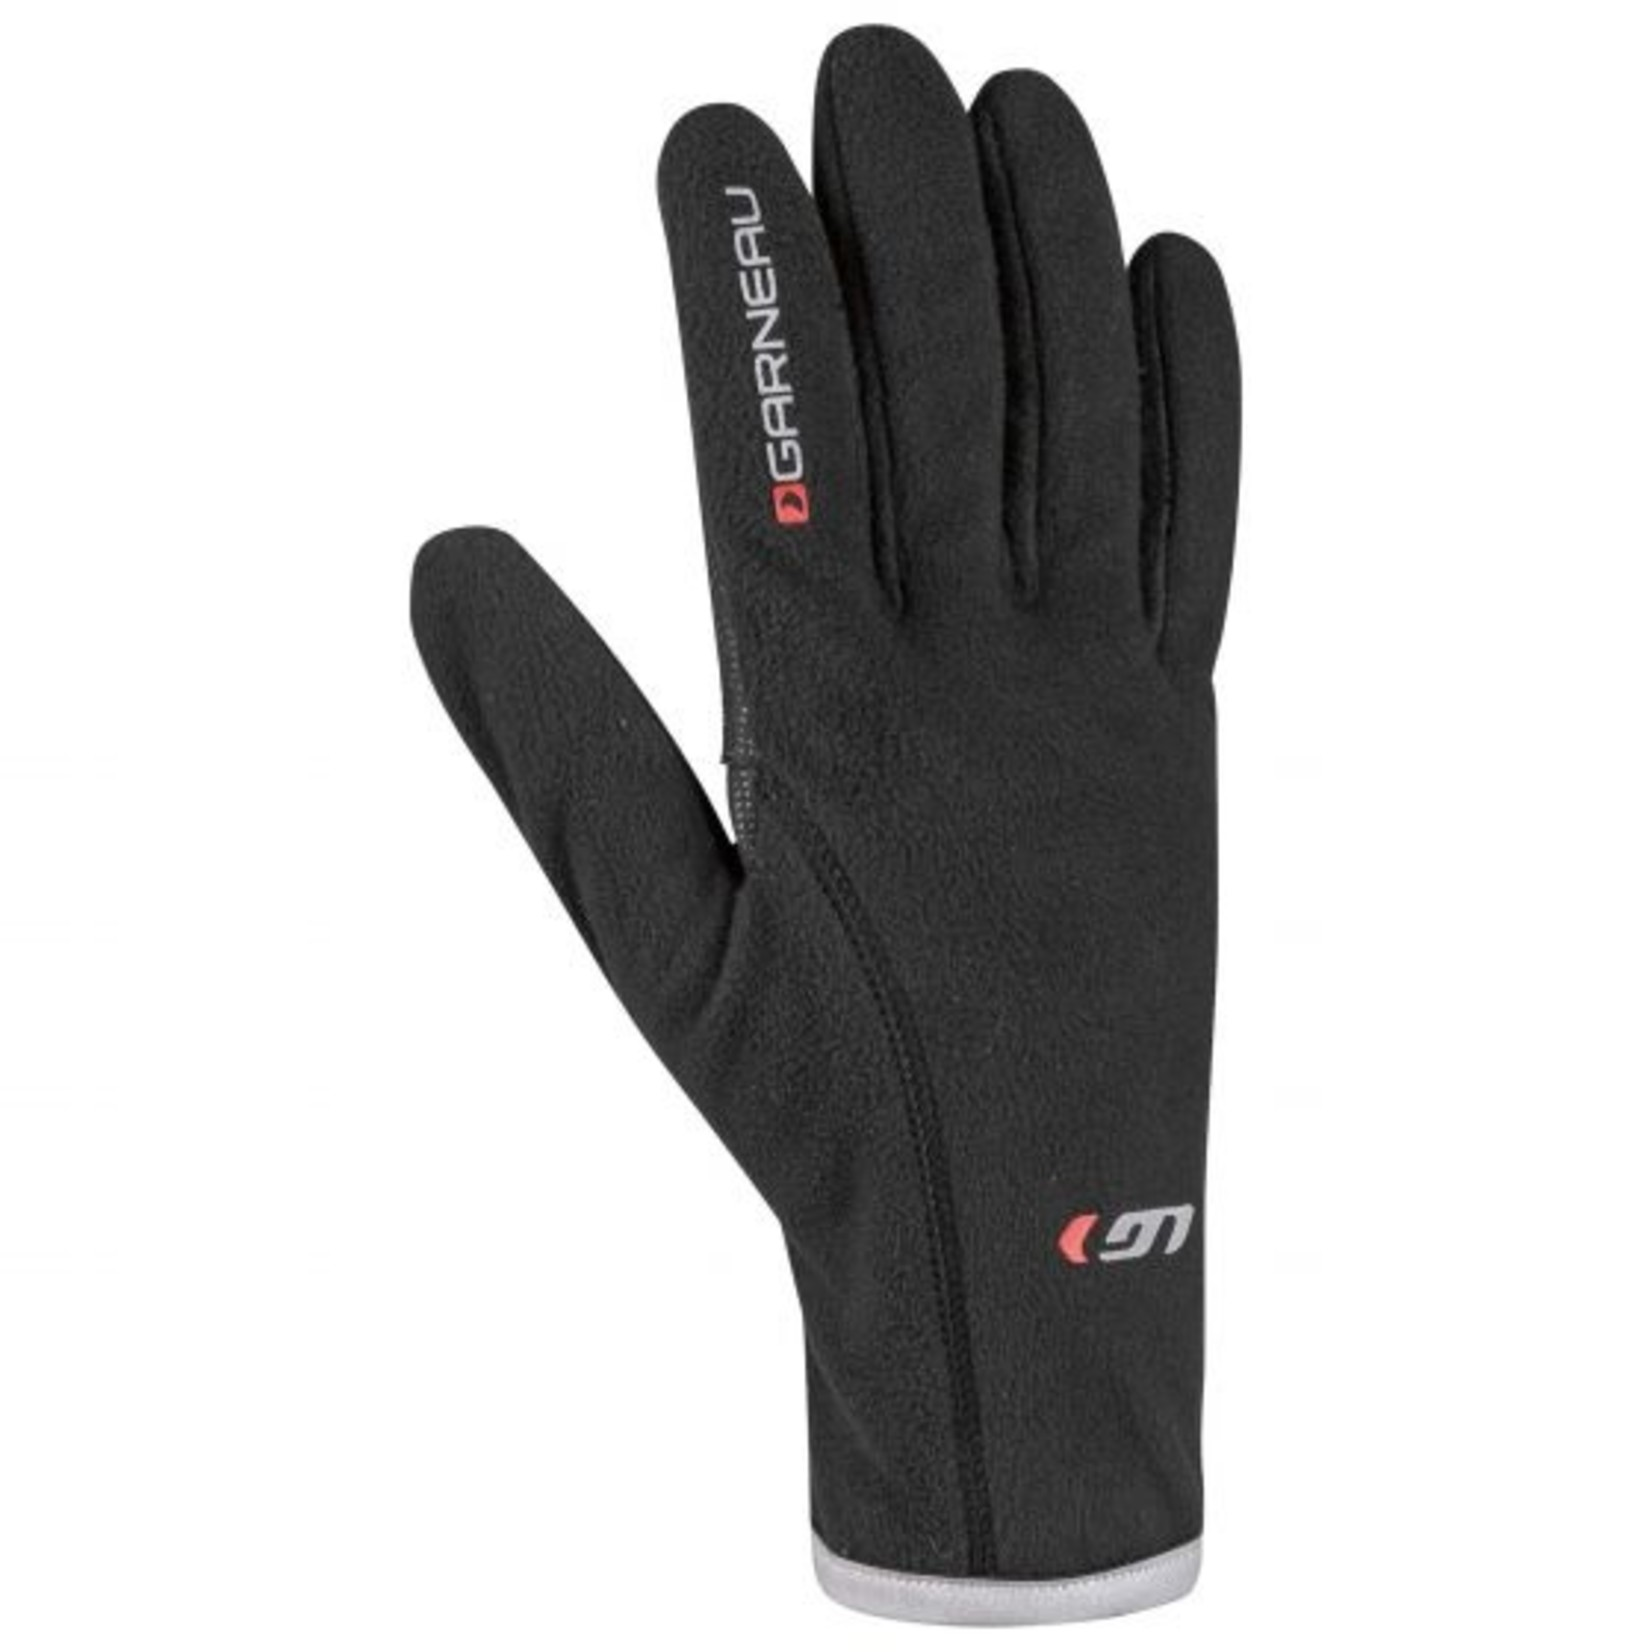 Louis Garneau Garneau Gel Ex Pro Gloves